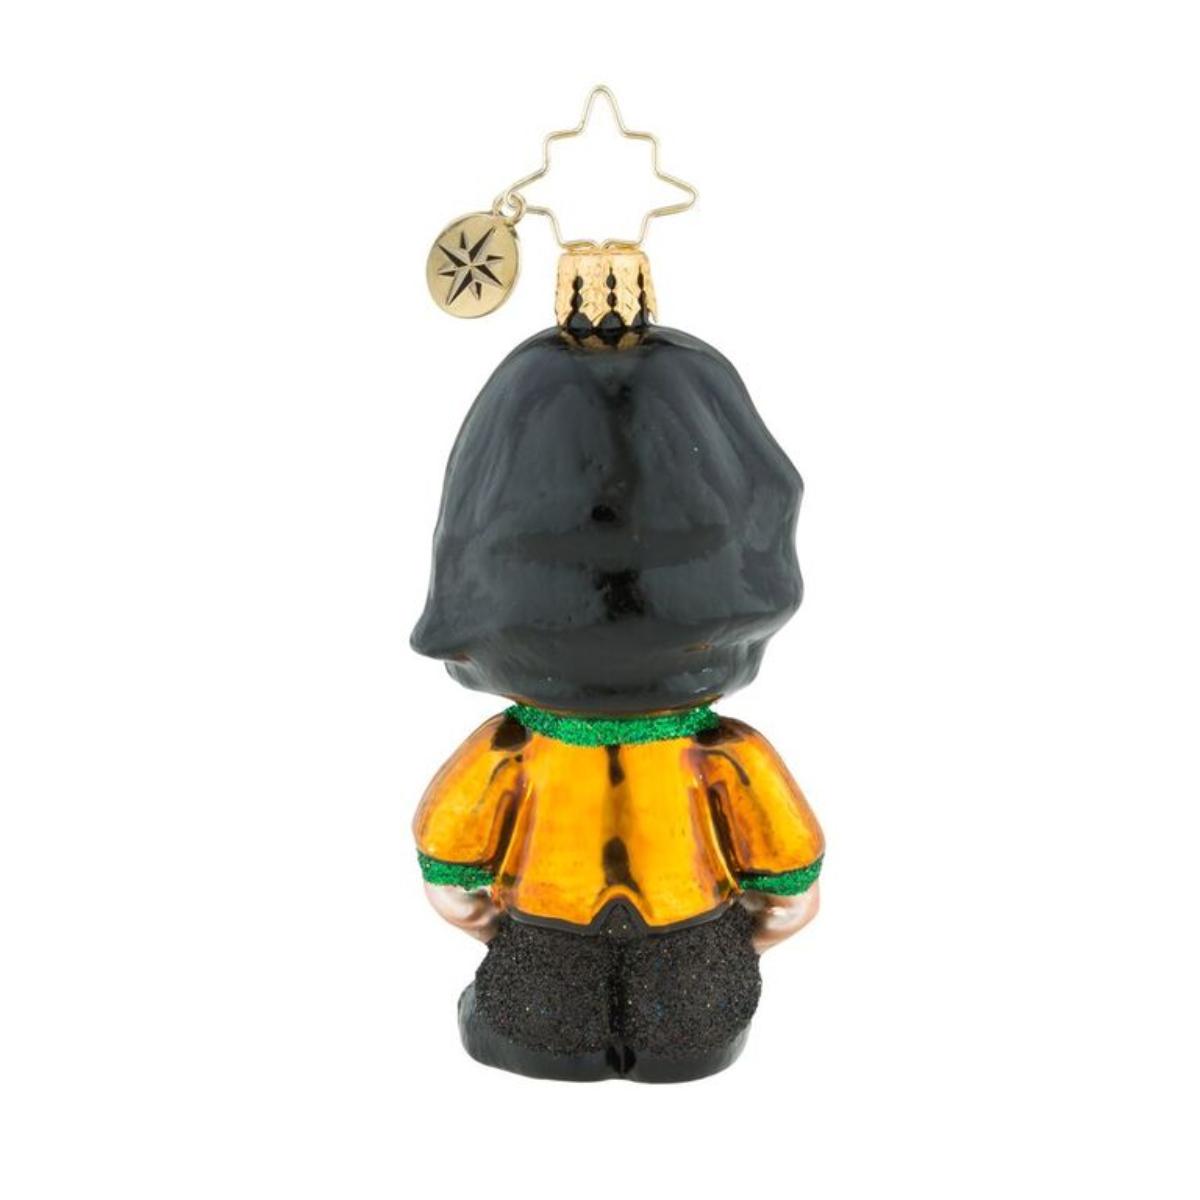 King George Gem Ornament